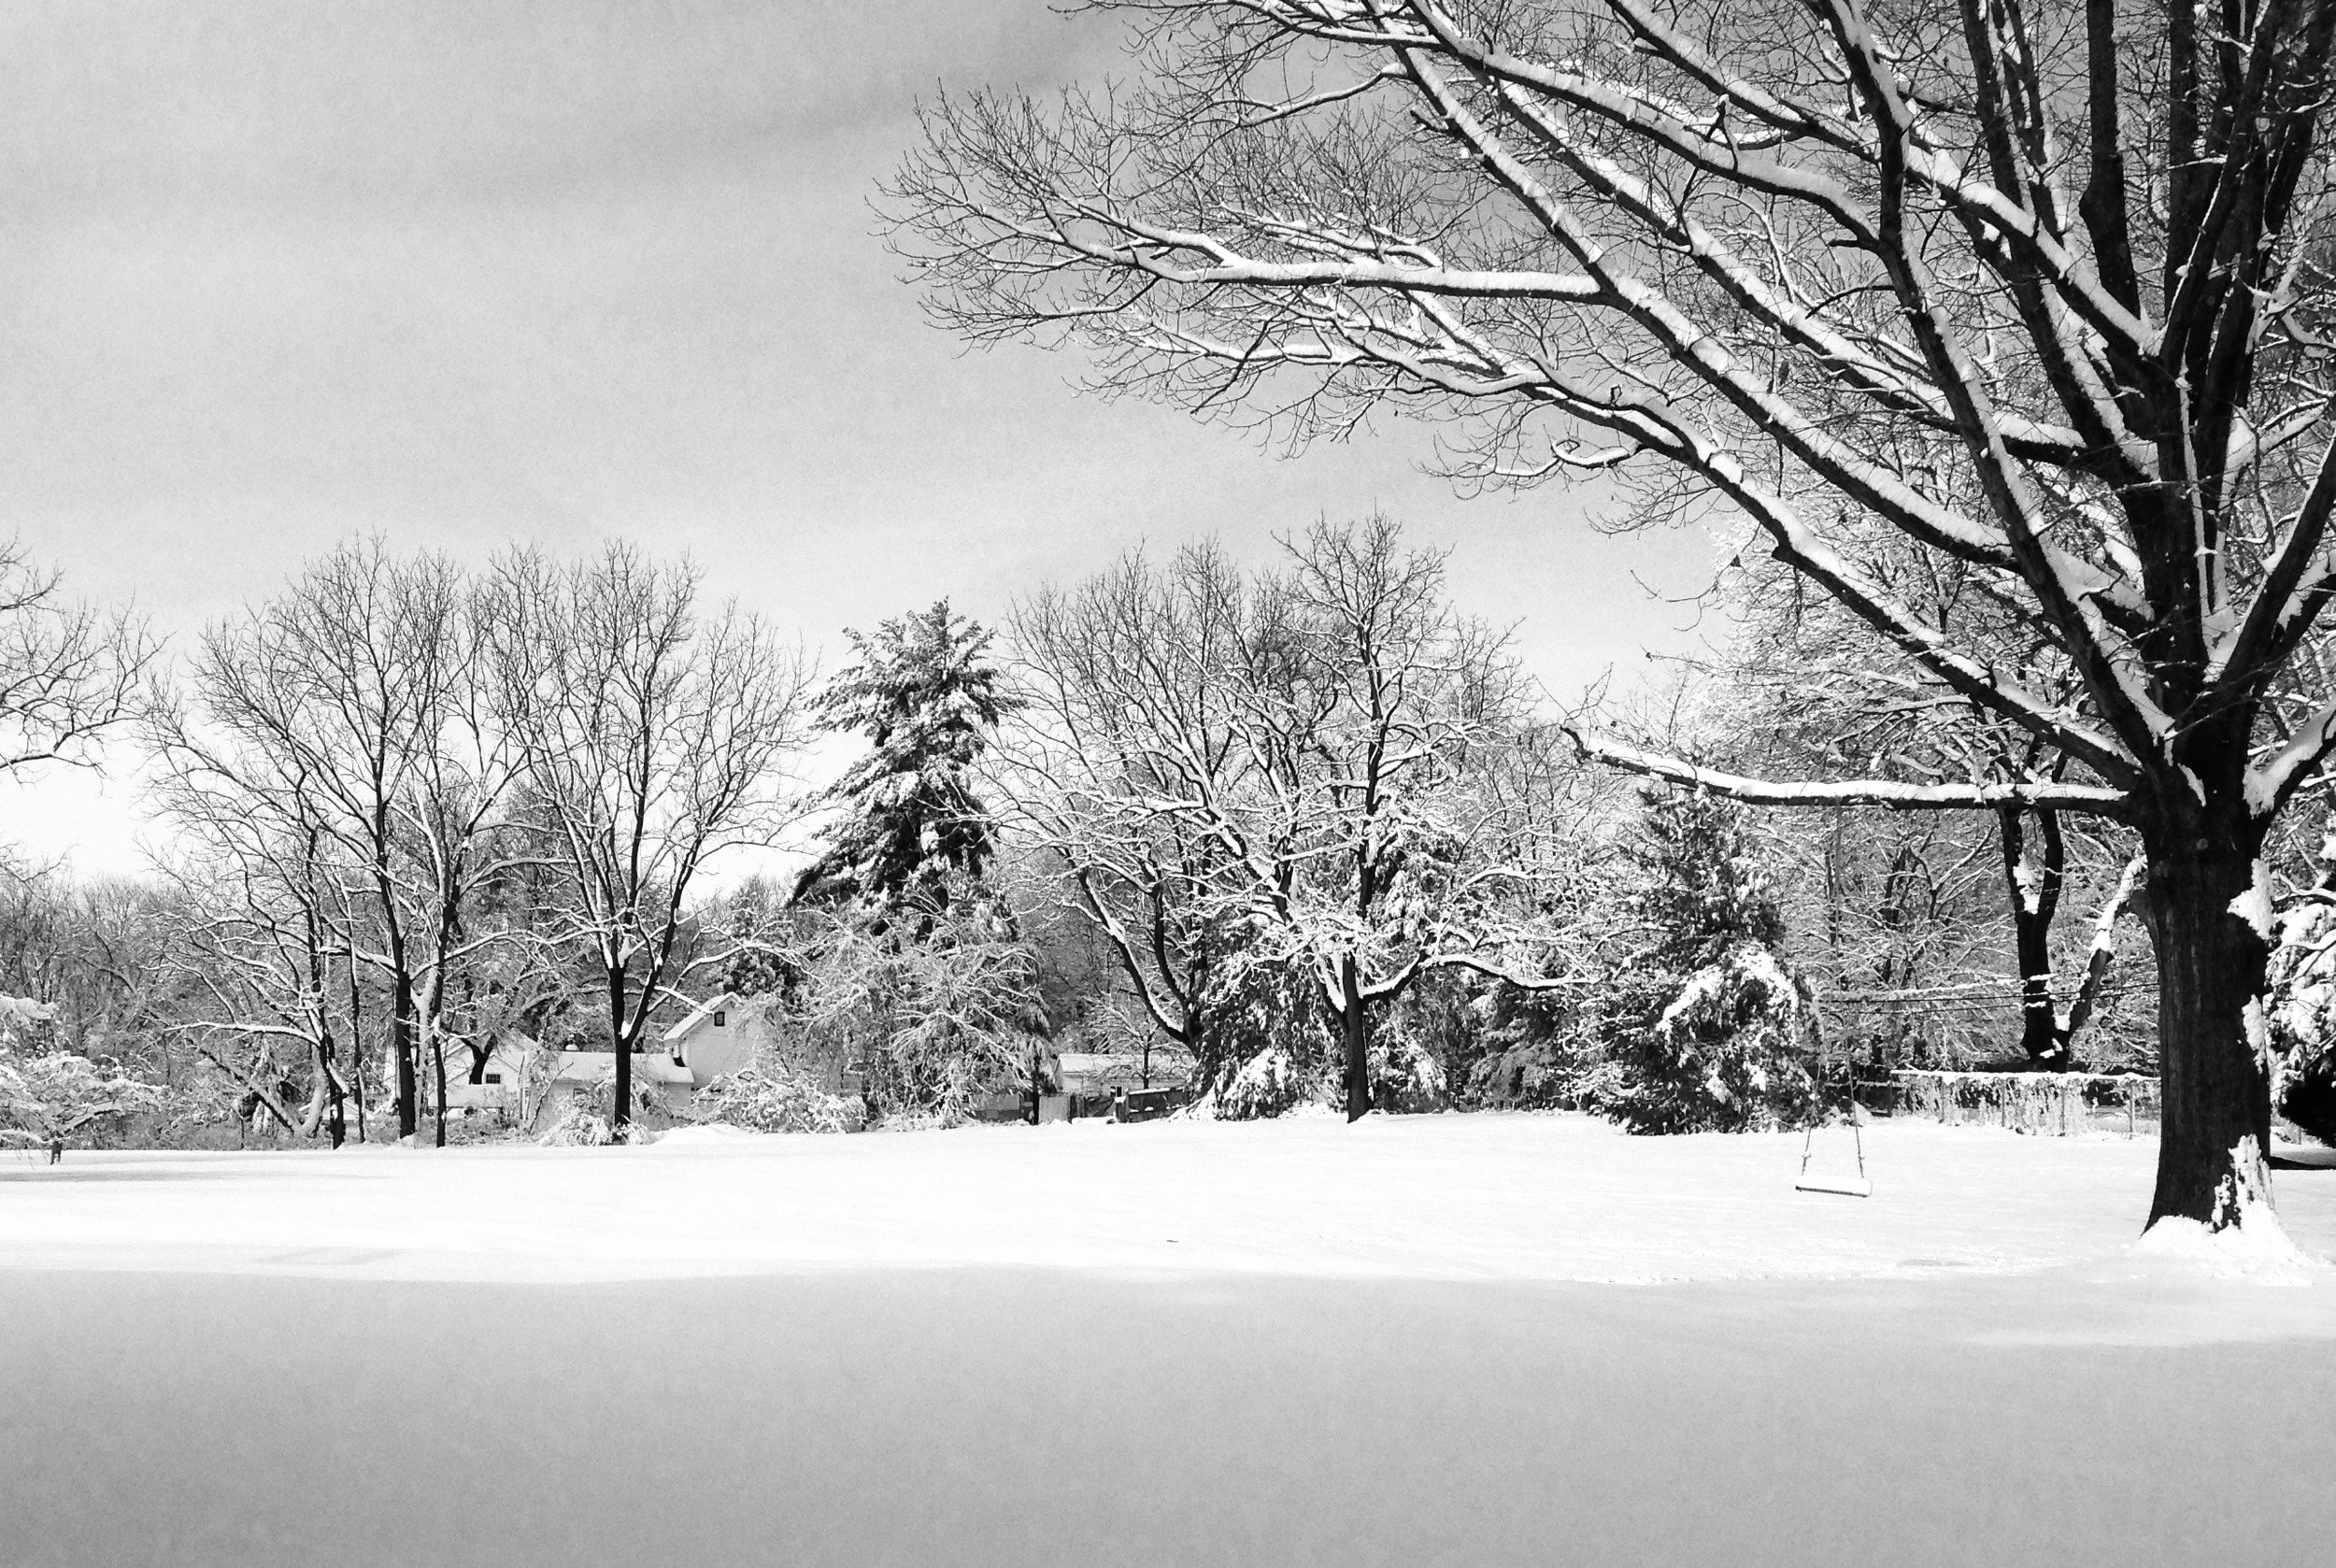 Winter #3